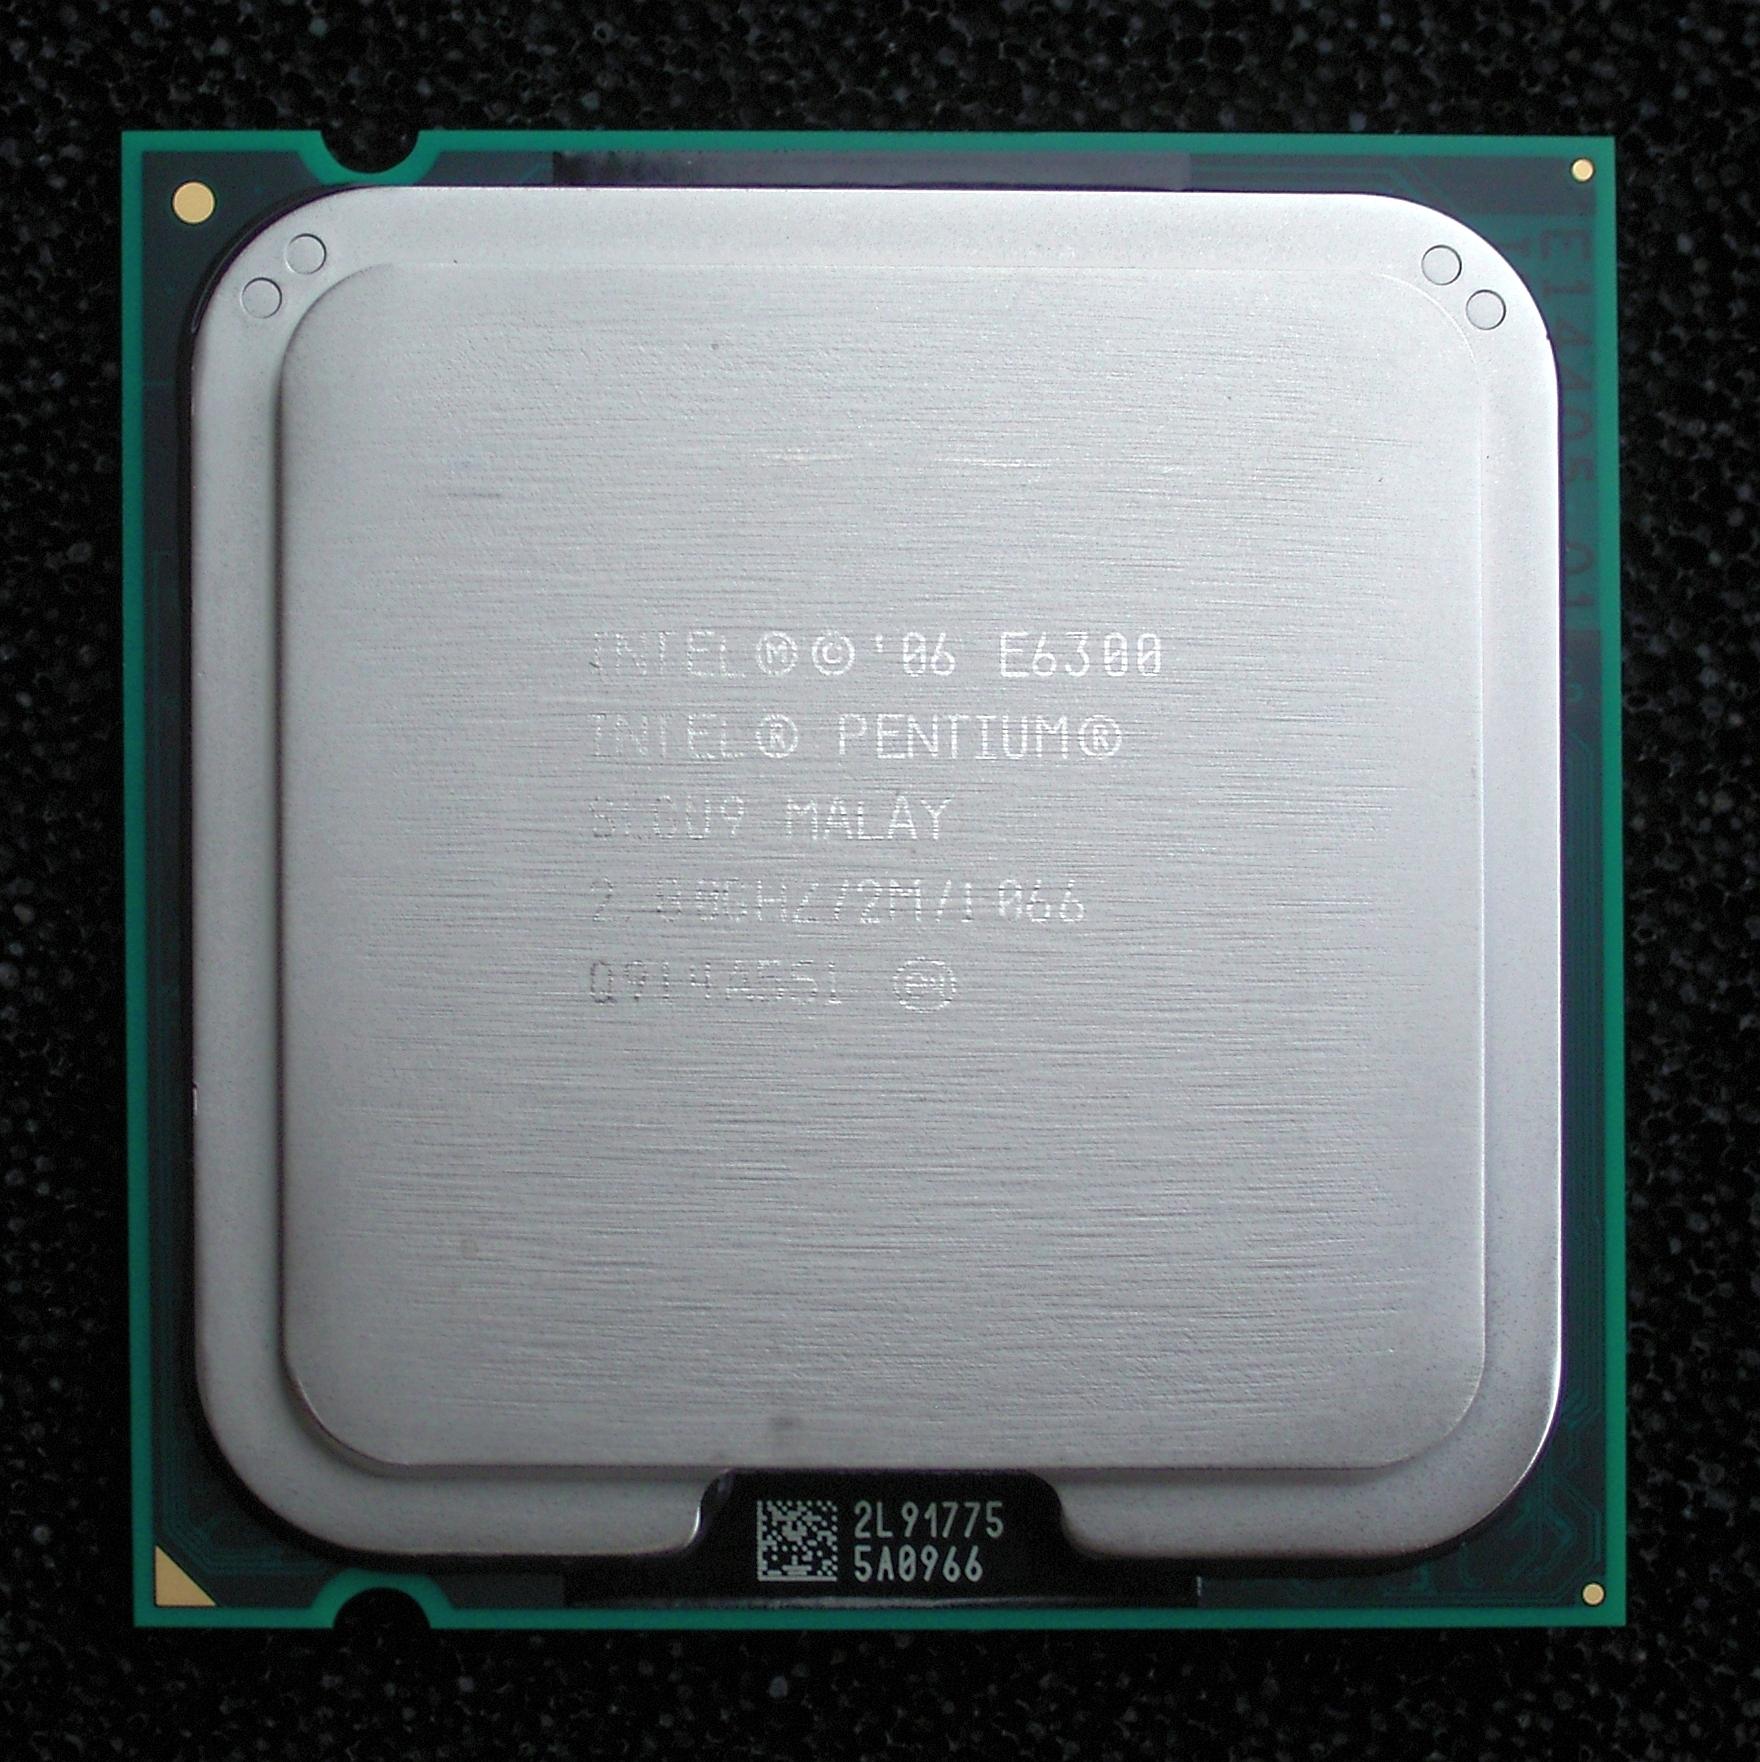 Intel dual core wiki : Percentage chart